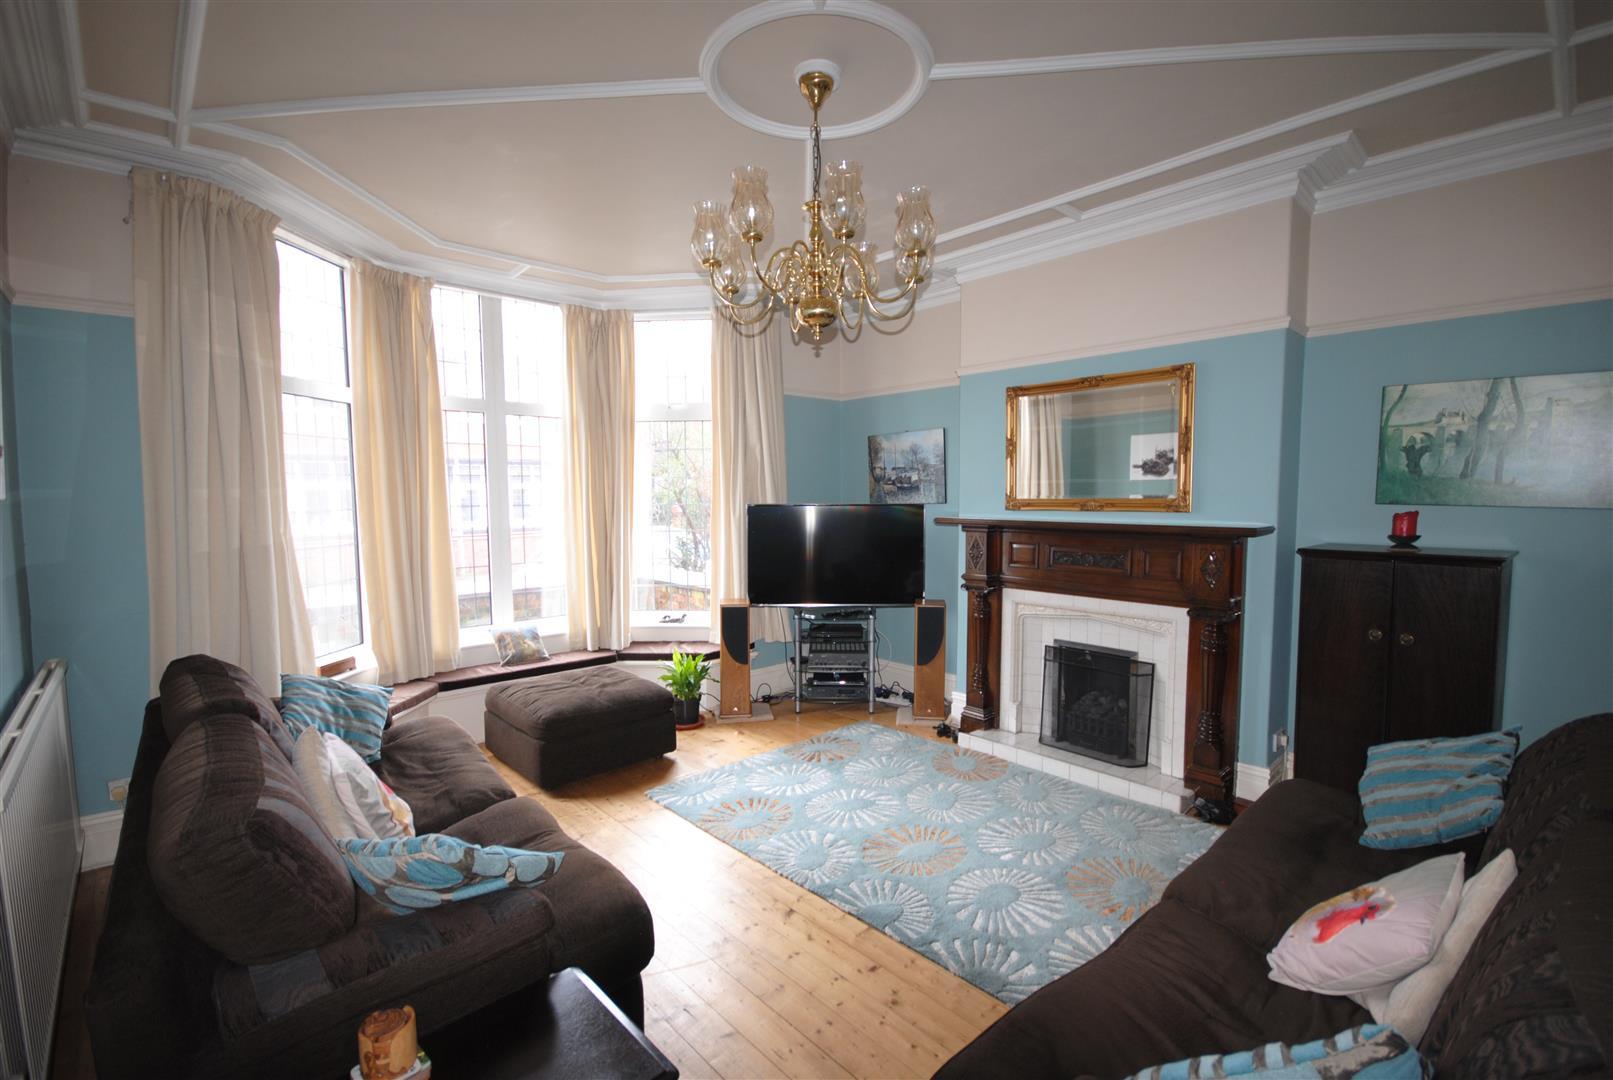 3 Bedrooms Property for sale in Trafalgar Road, Wigan